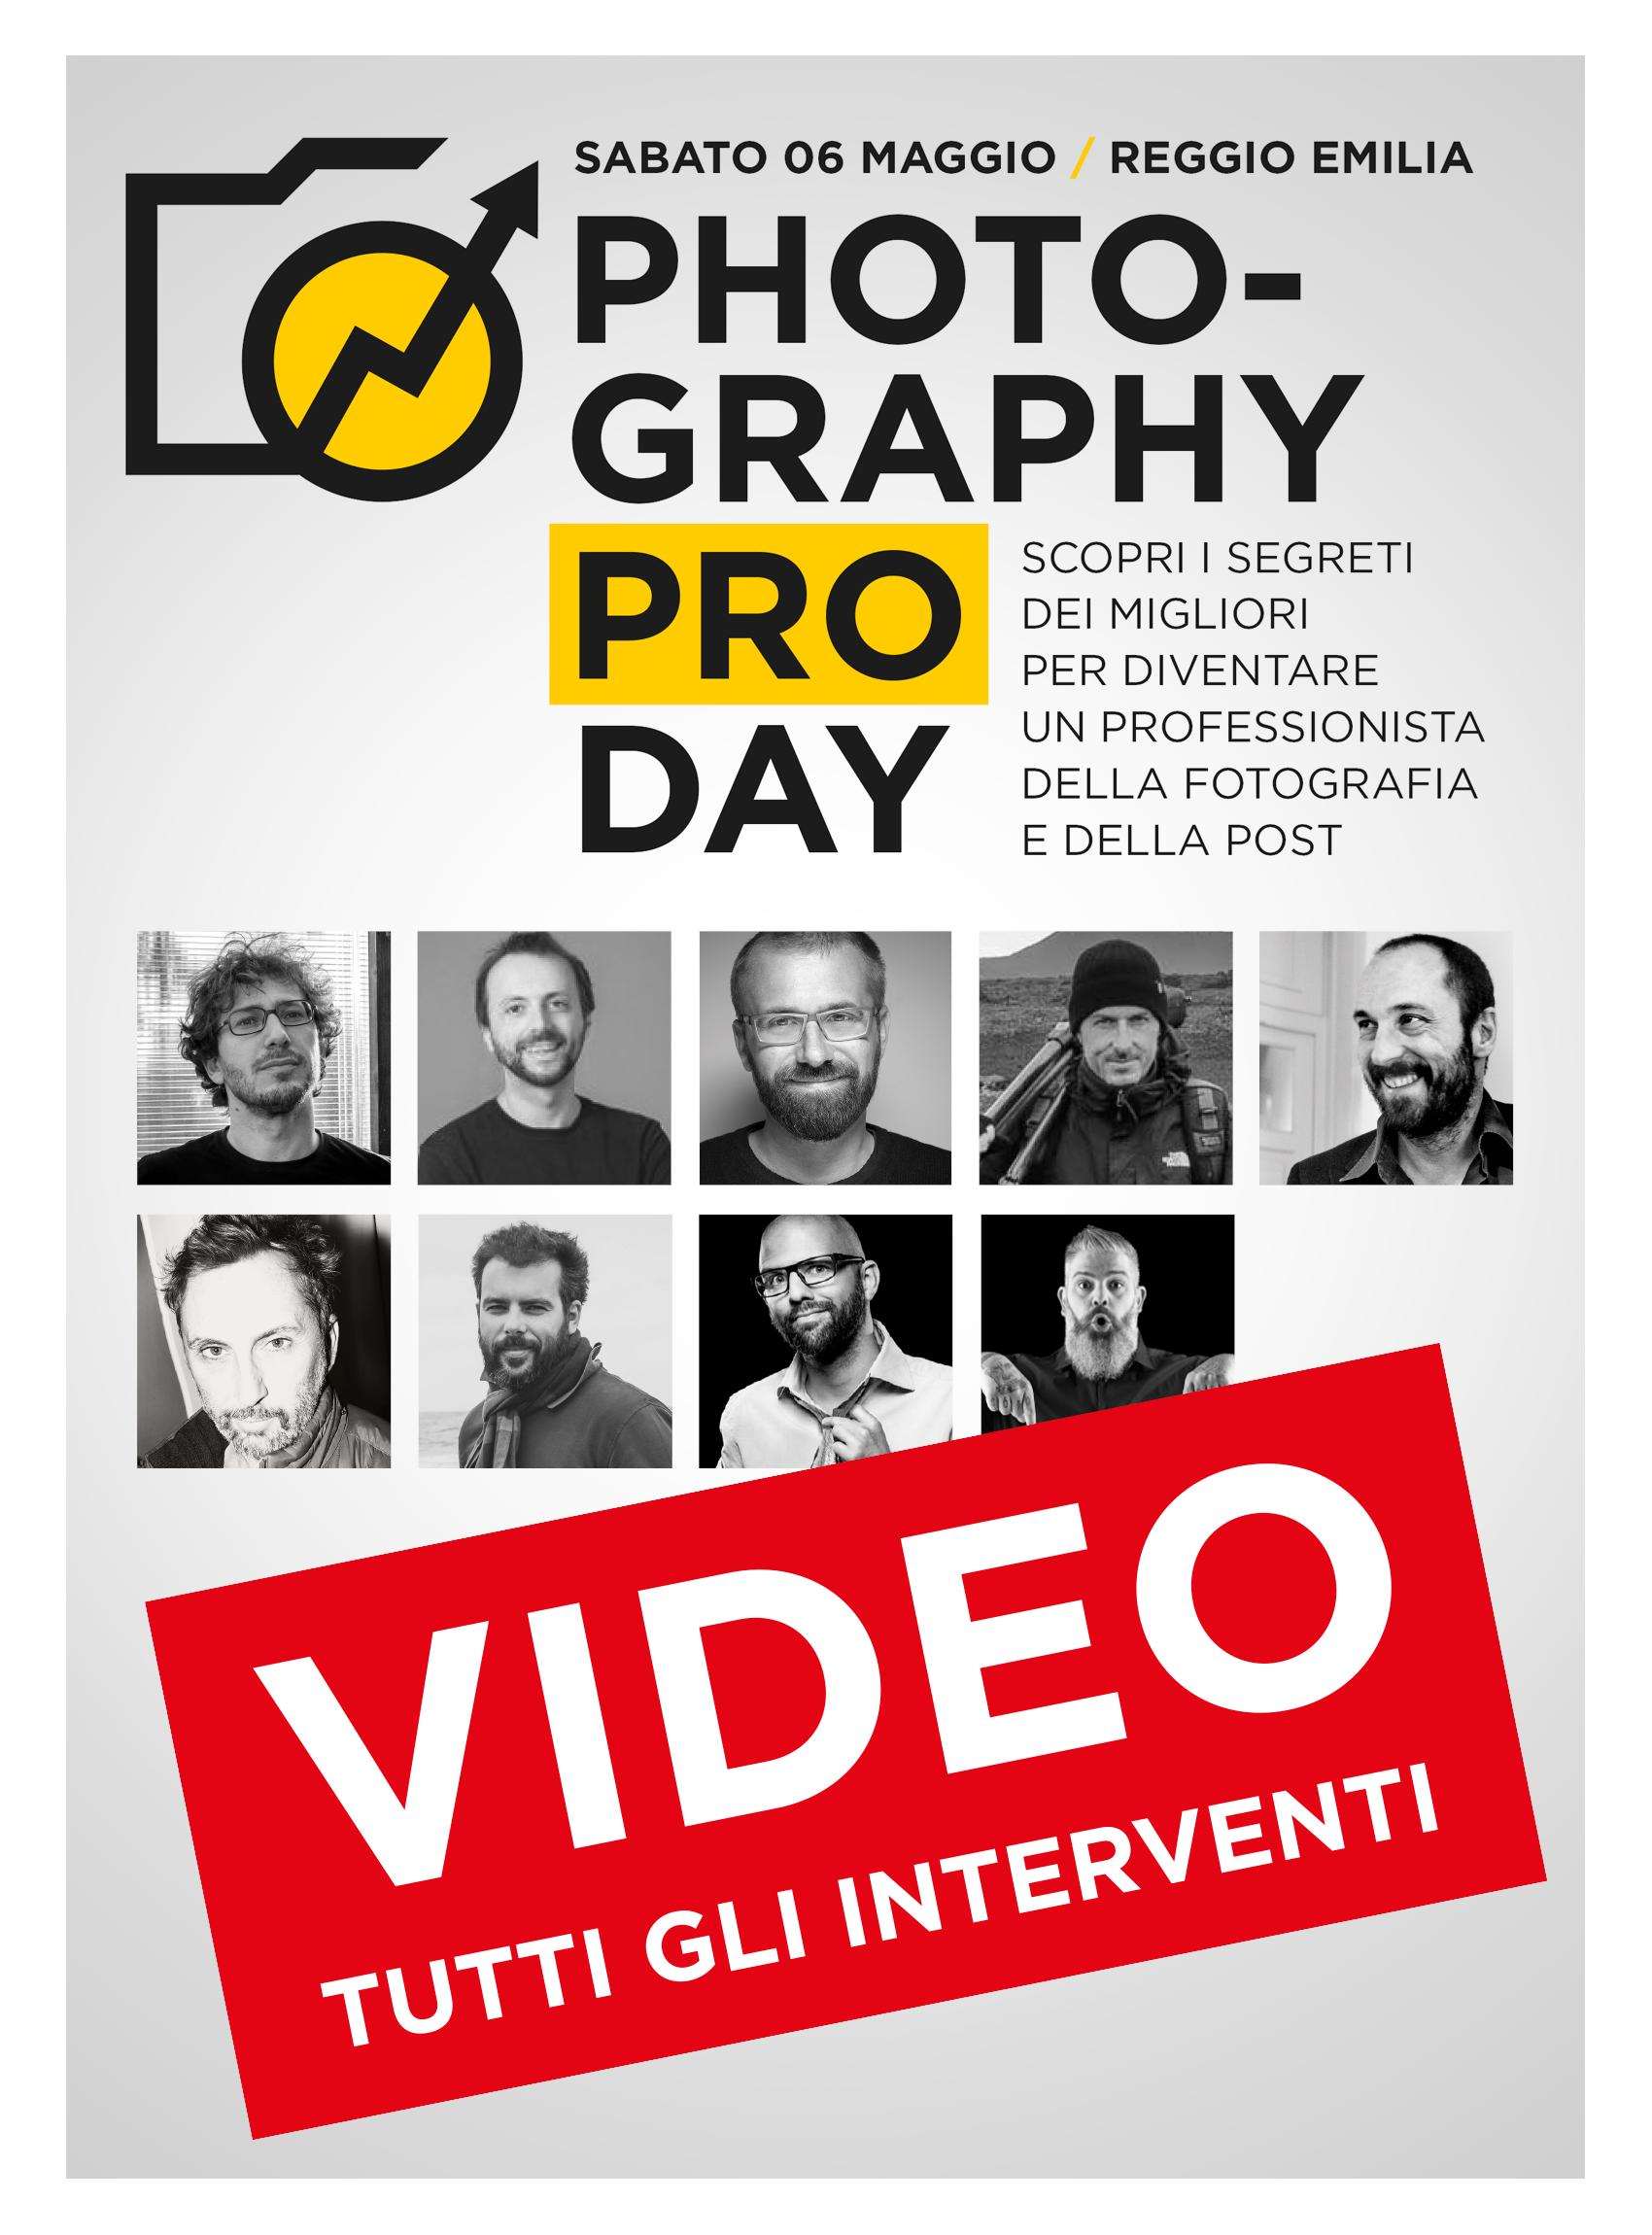 Photography Pro Day 2017 - Video-interventi